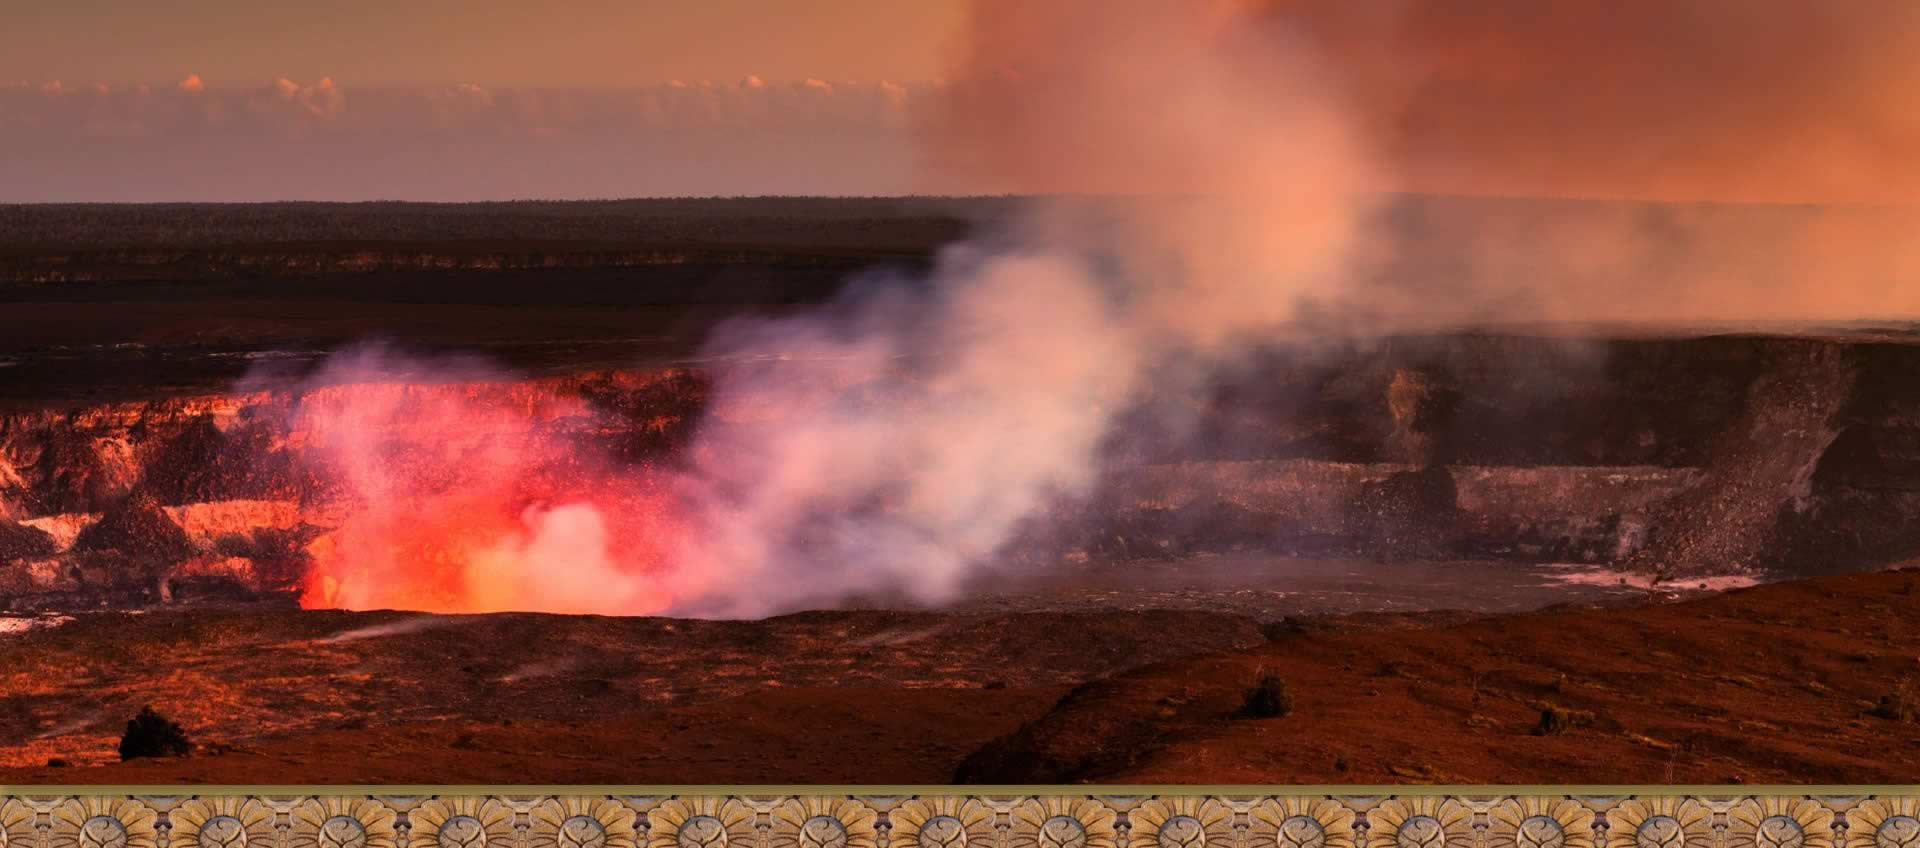 Volcanic adventures